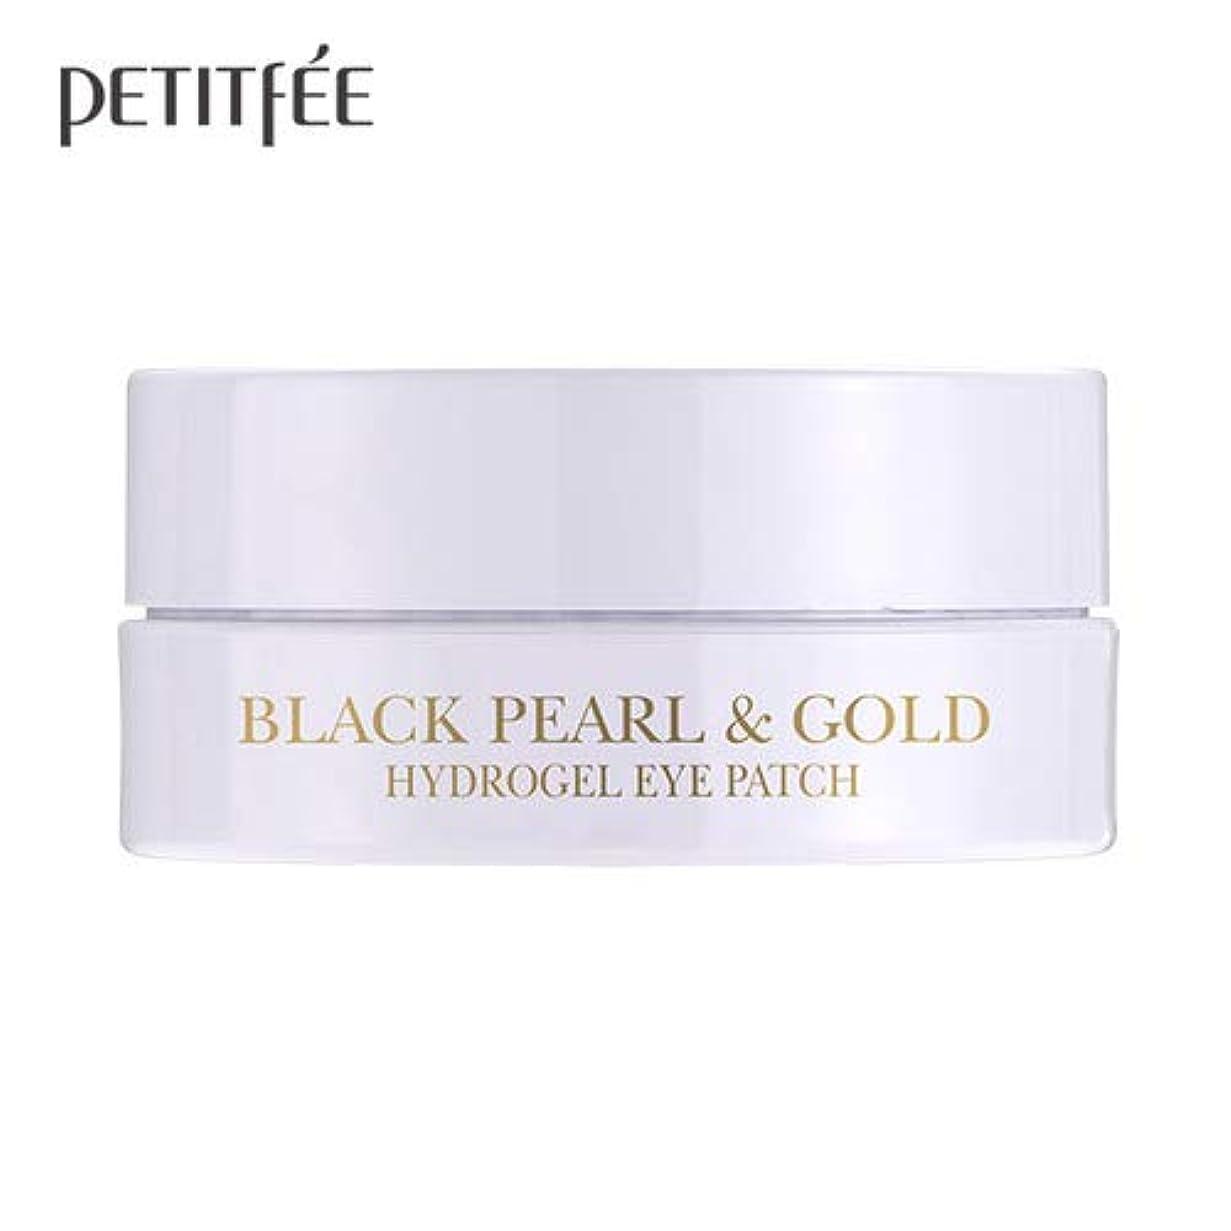 Petitfee [プチフェ] ブラックパール&ゴールド ハイドロゲルアイパッチ / Black pearl & Gold Eye Patch (60枚)